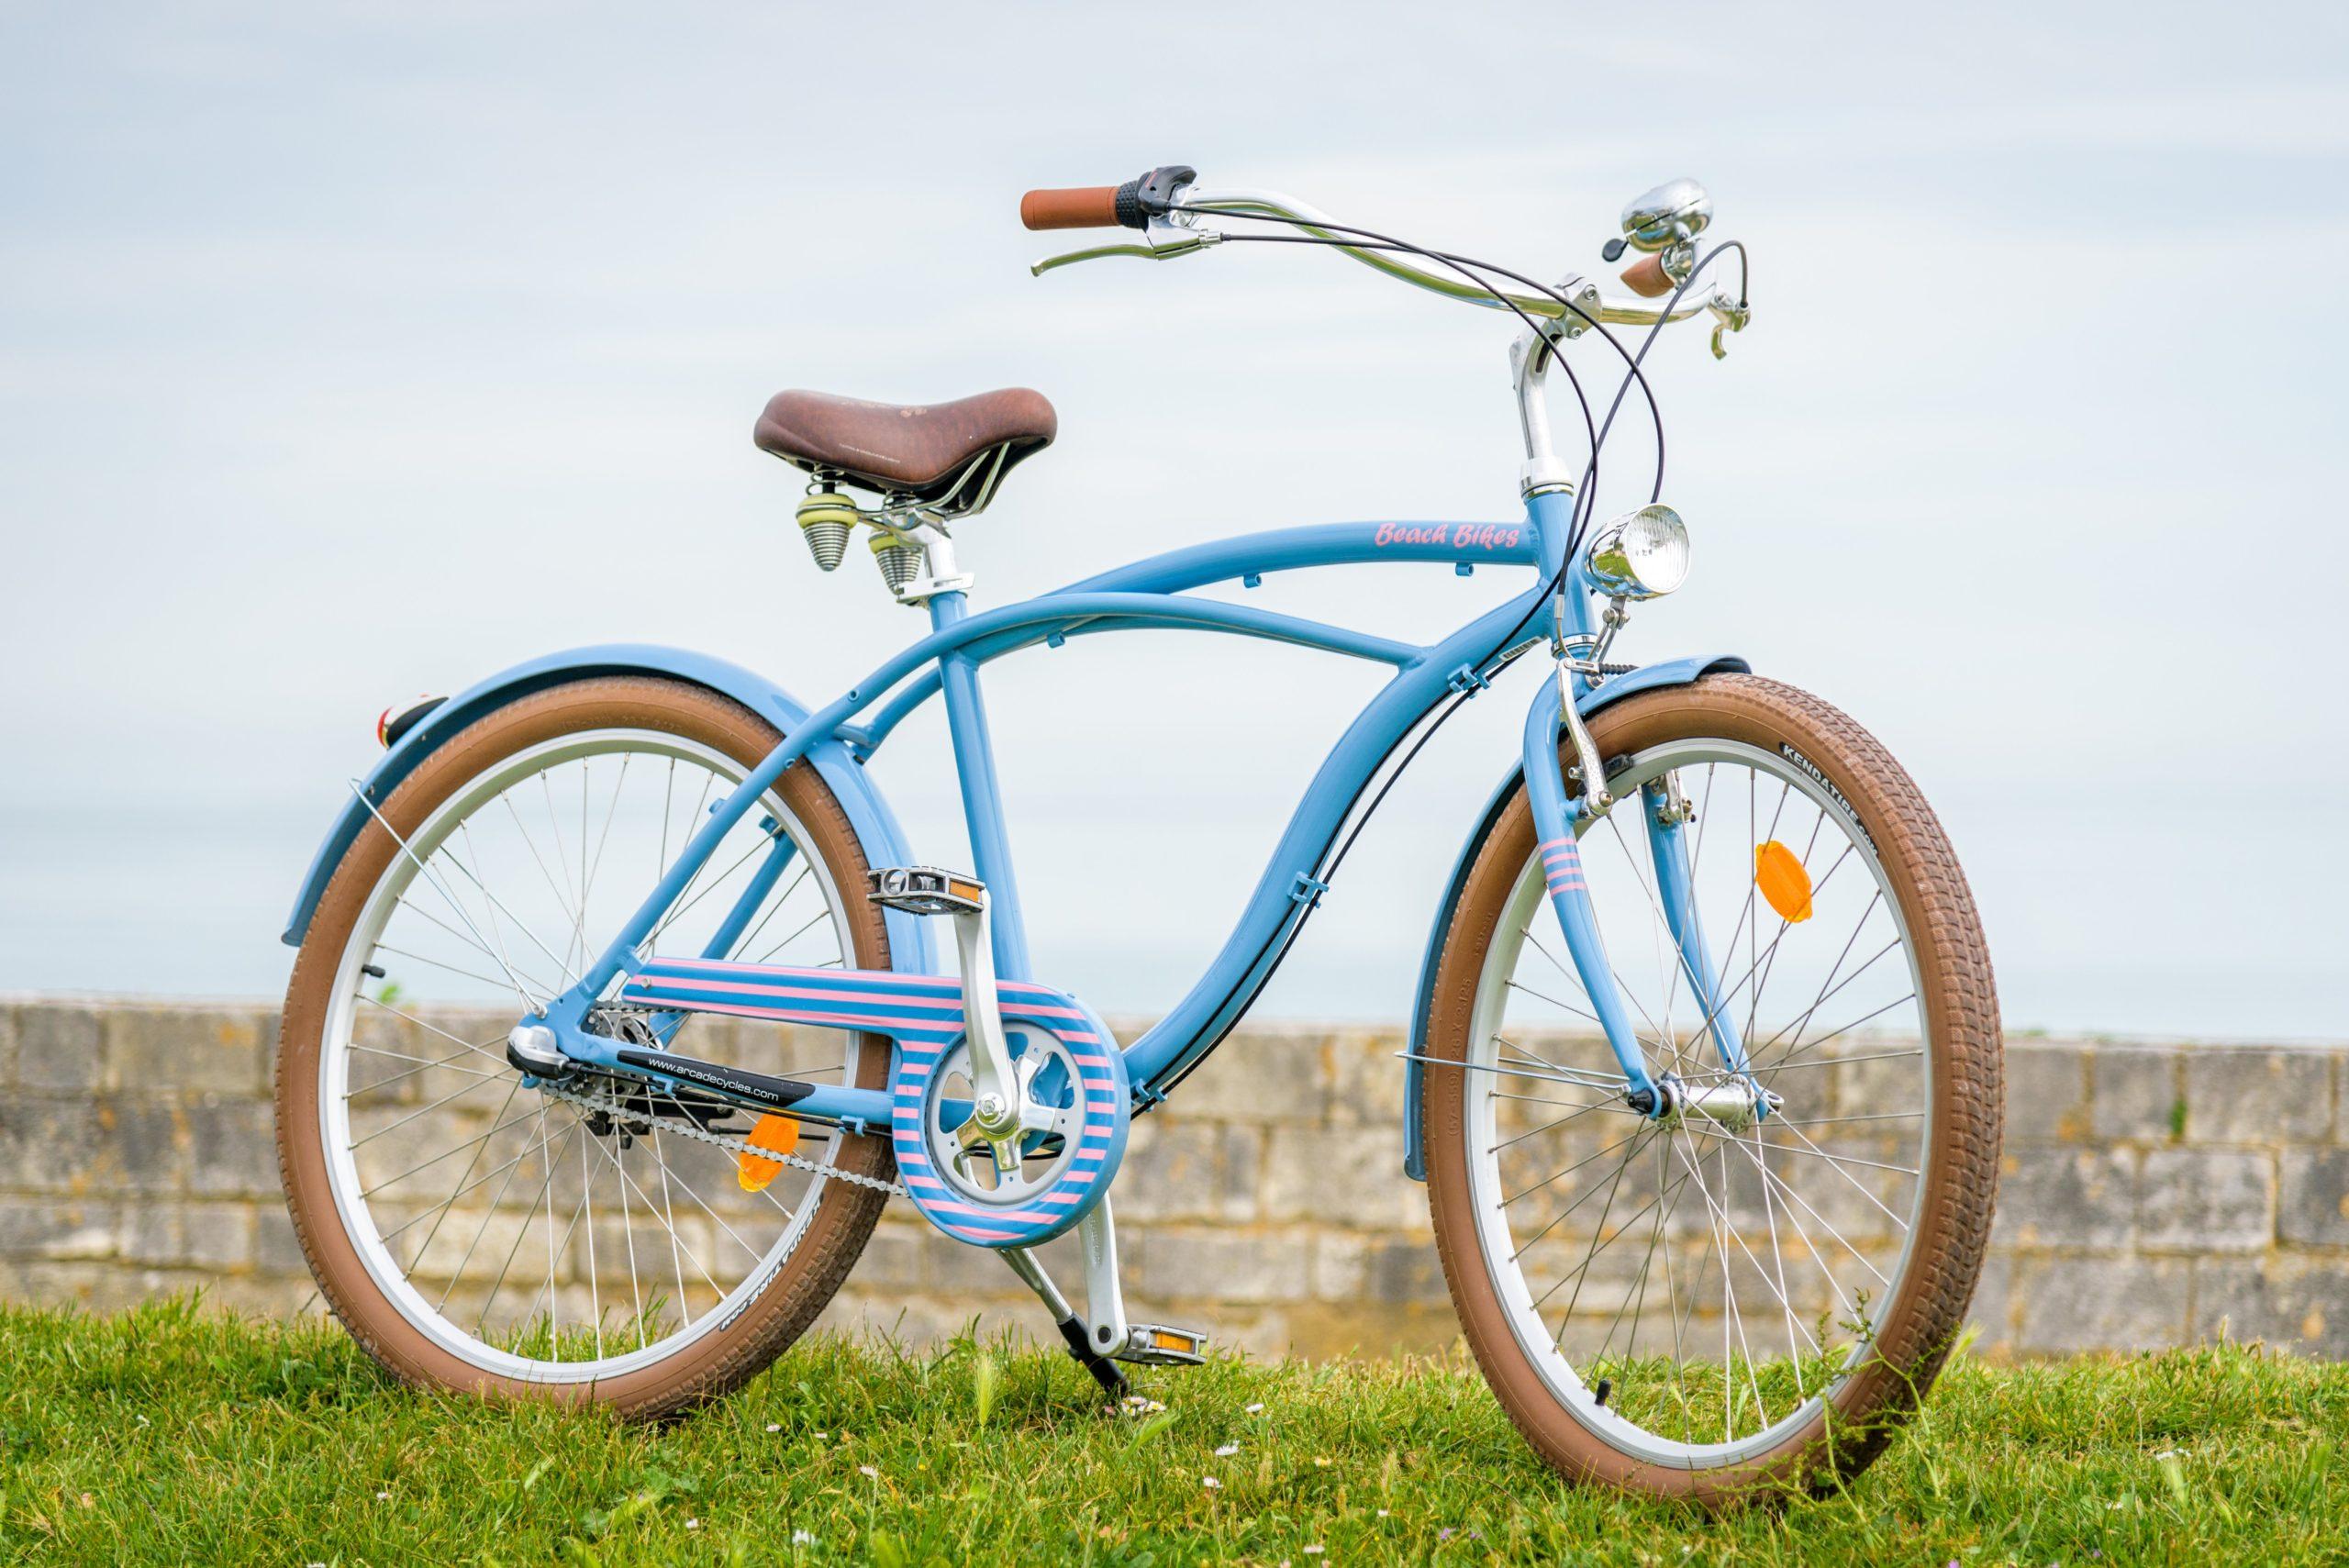 Velo beach cruiser Francais beach bikes